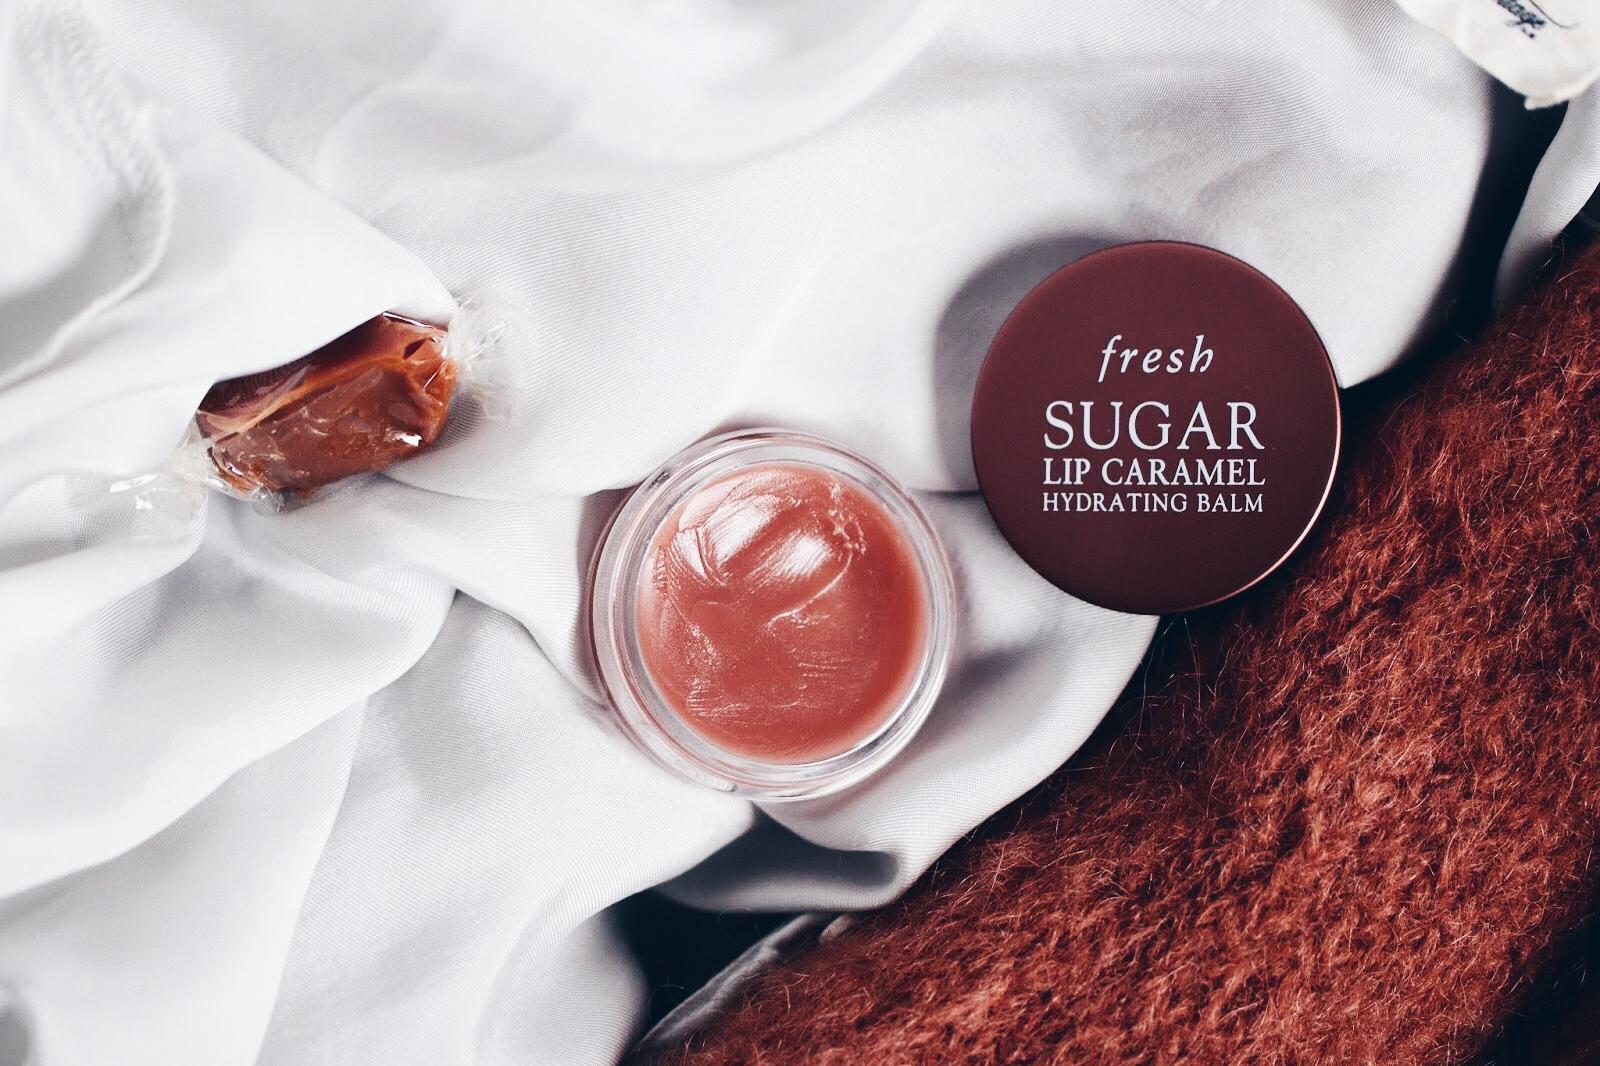 fresh sugar lip caramel baume à lèvres hydratant avis test swatch